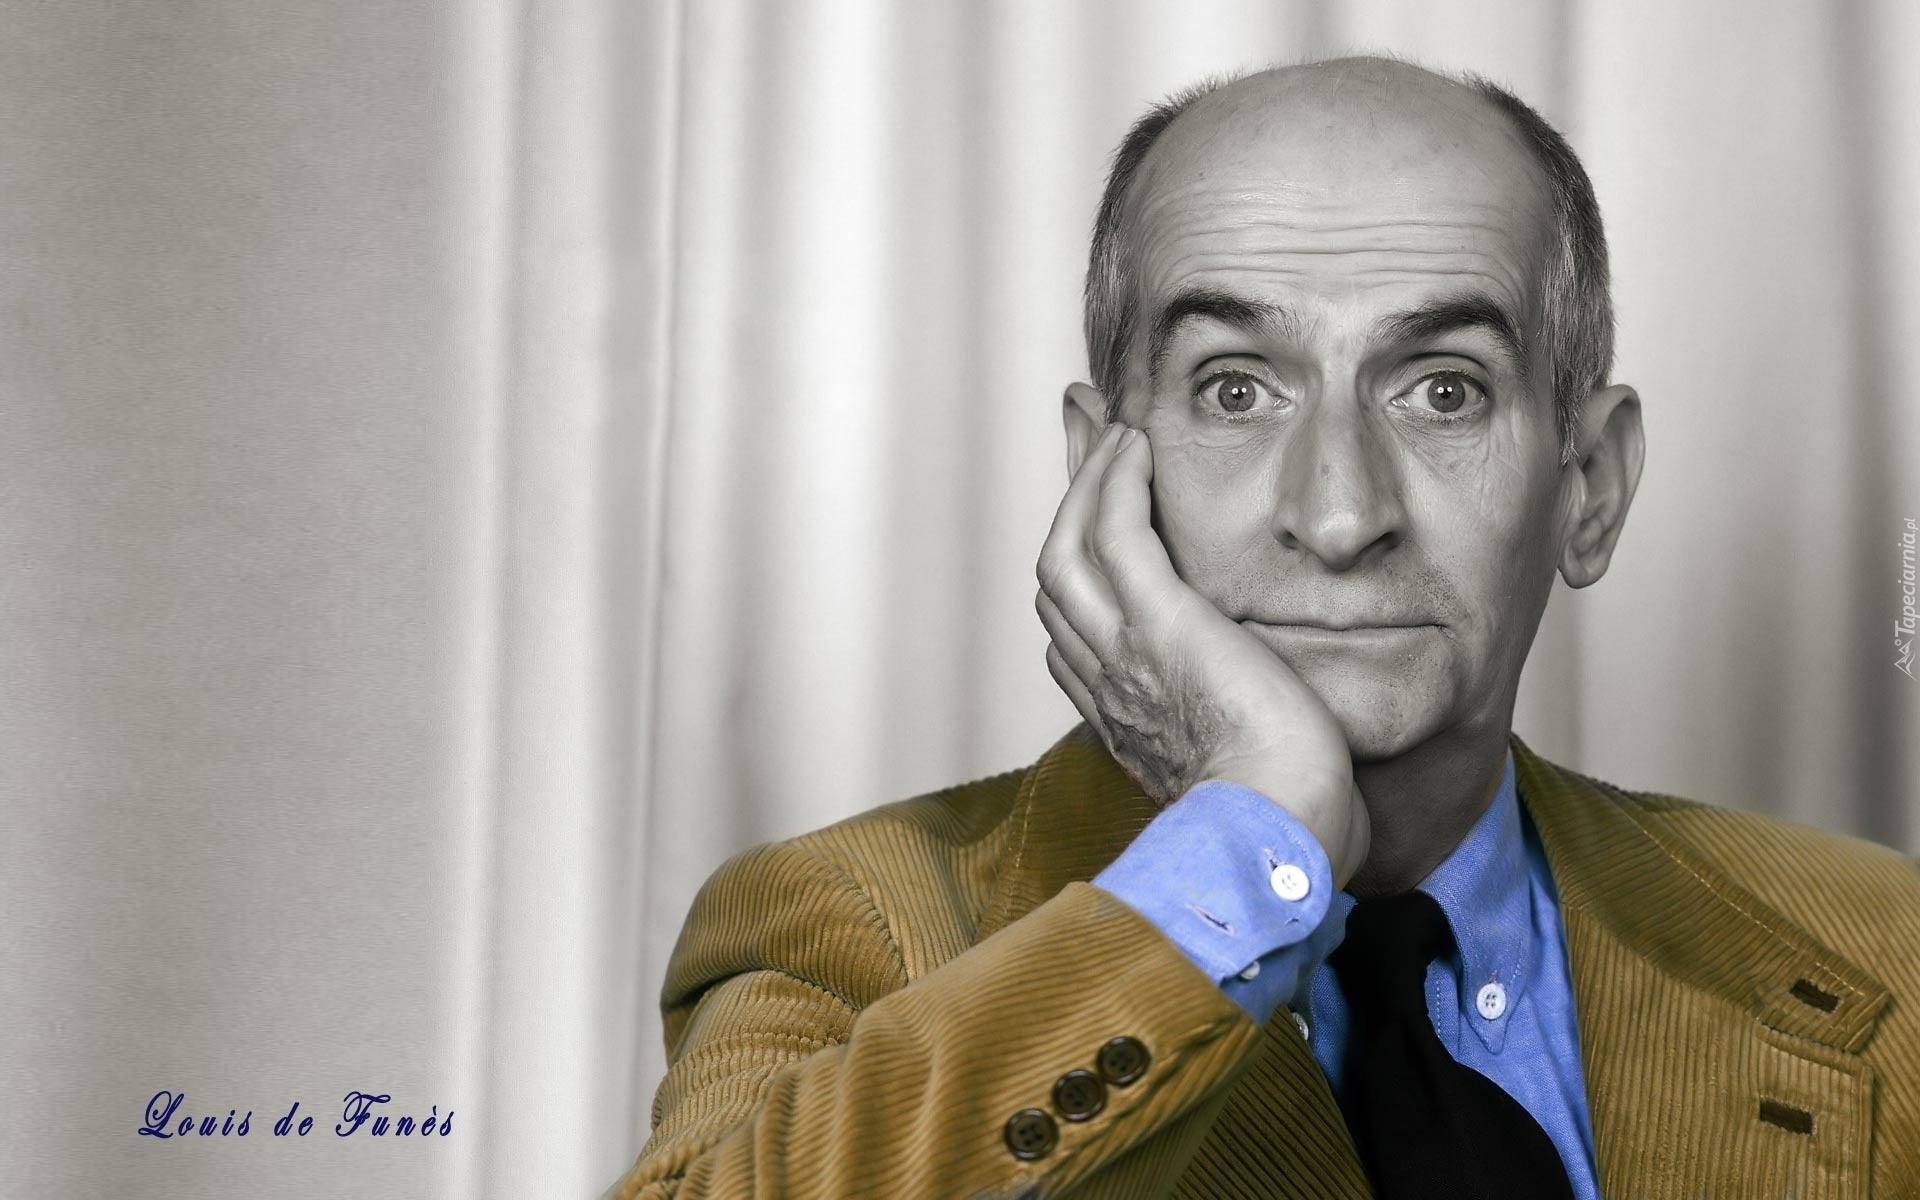 Louis de Funes, Aktor